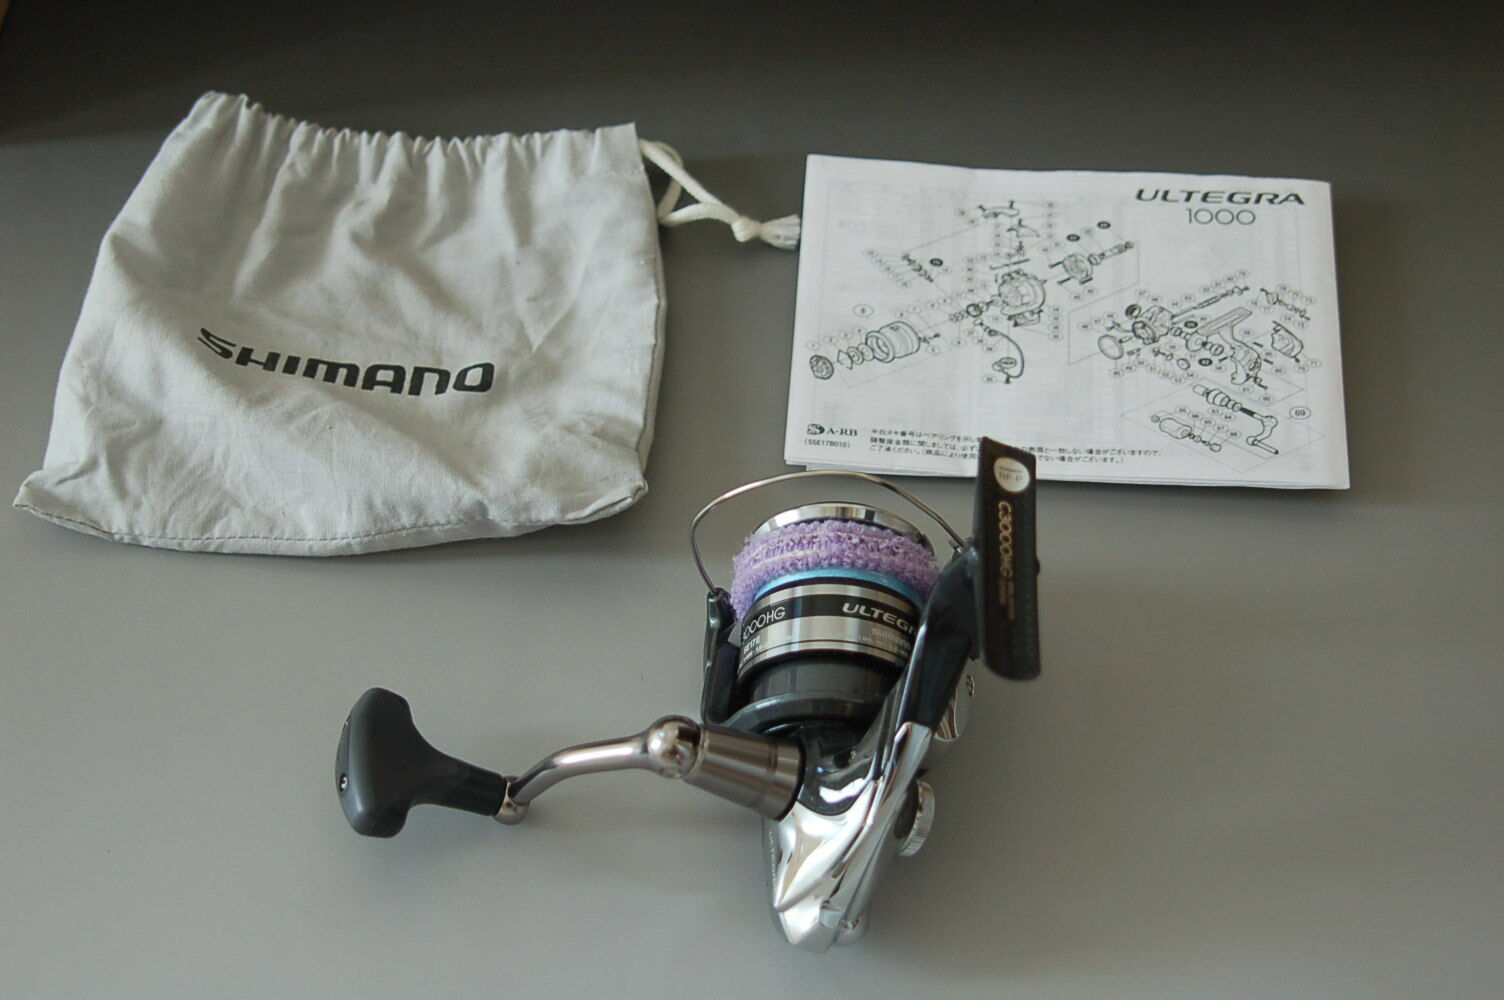 2012 SHIMANO ULTEGRA ULTEGRA SHIMANO C3000HG 30041909 e2ba56